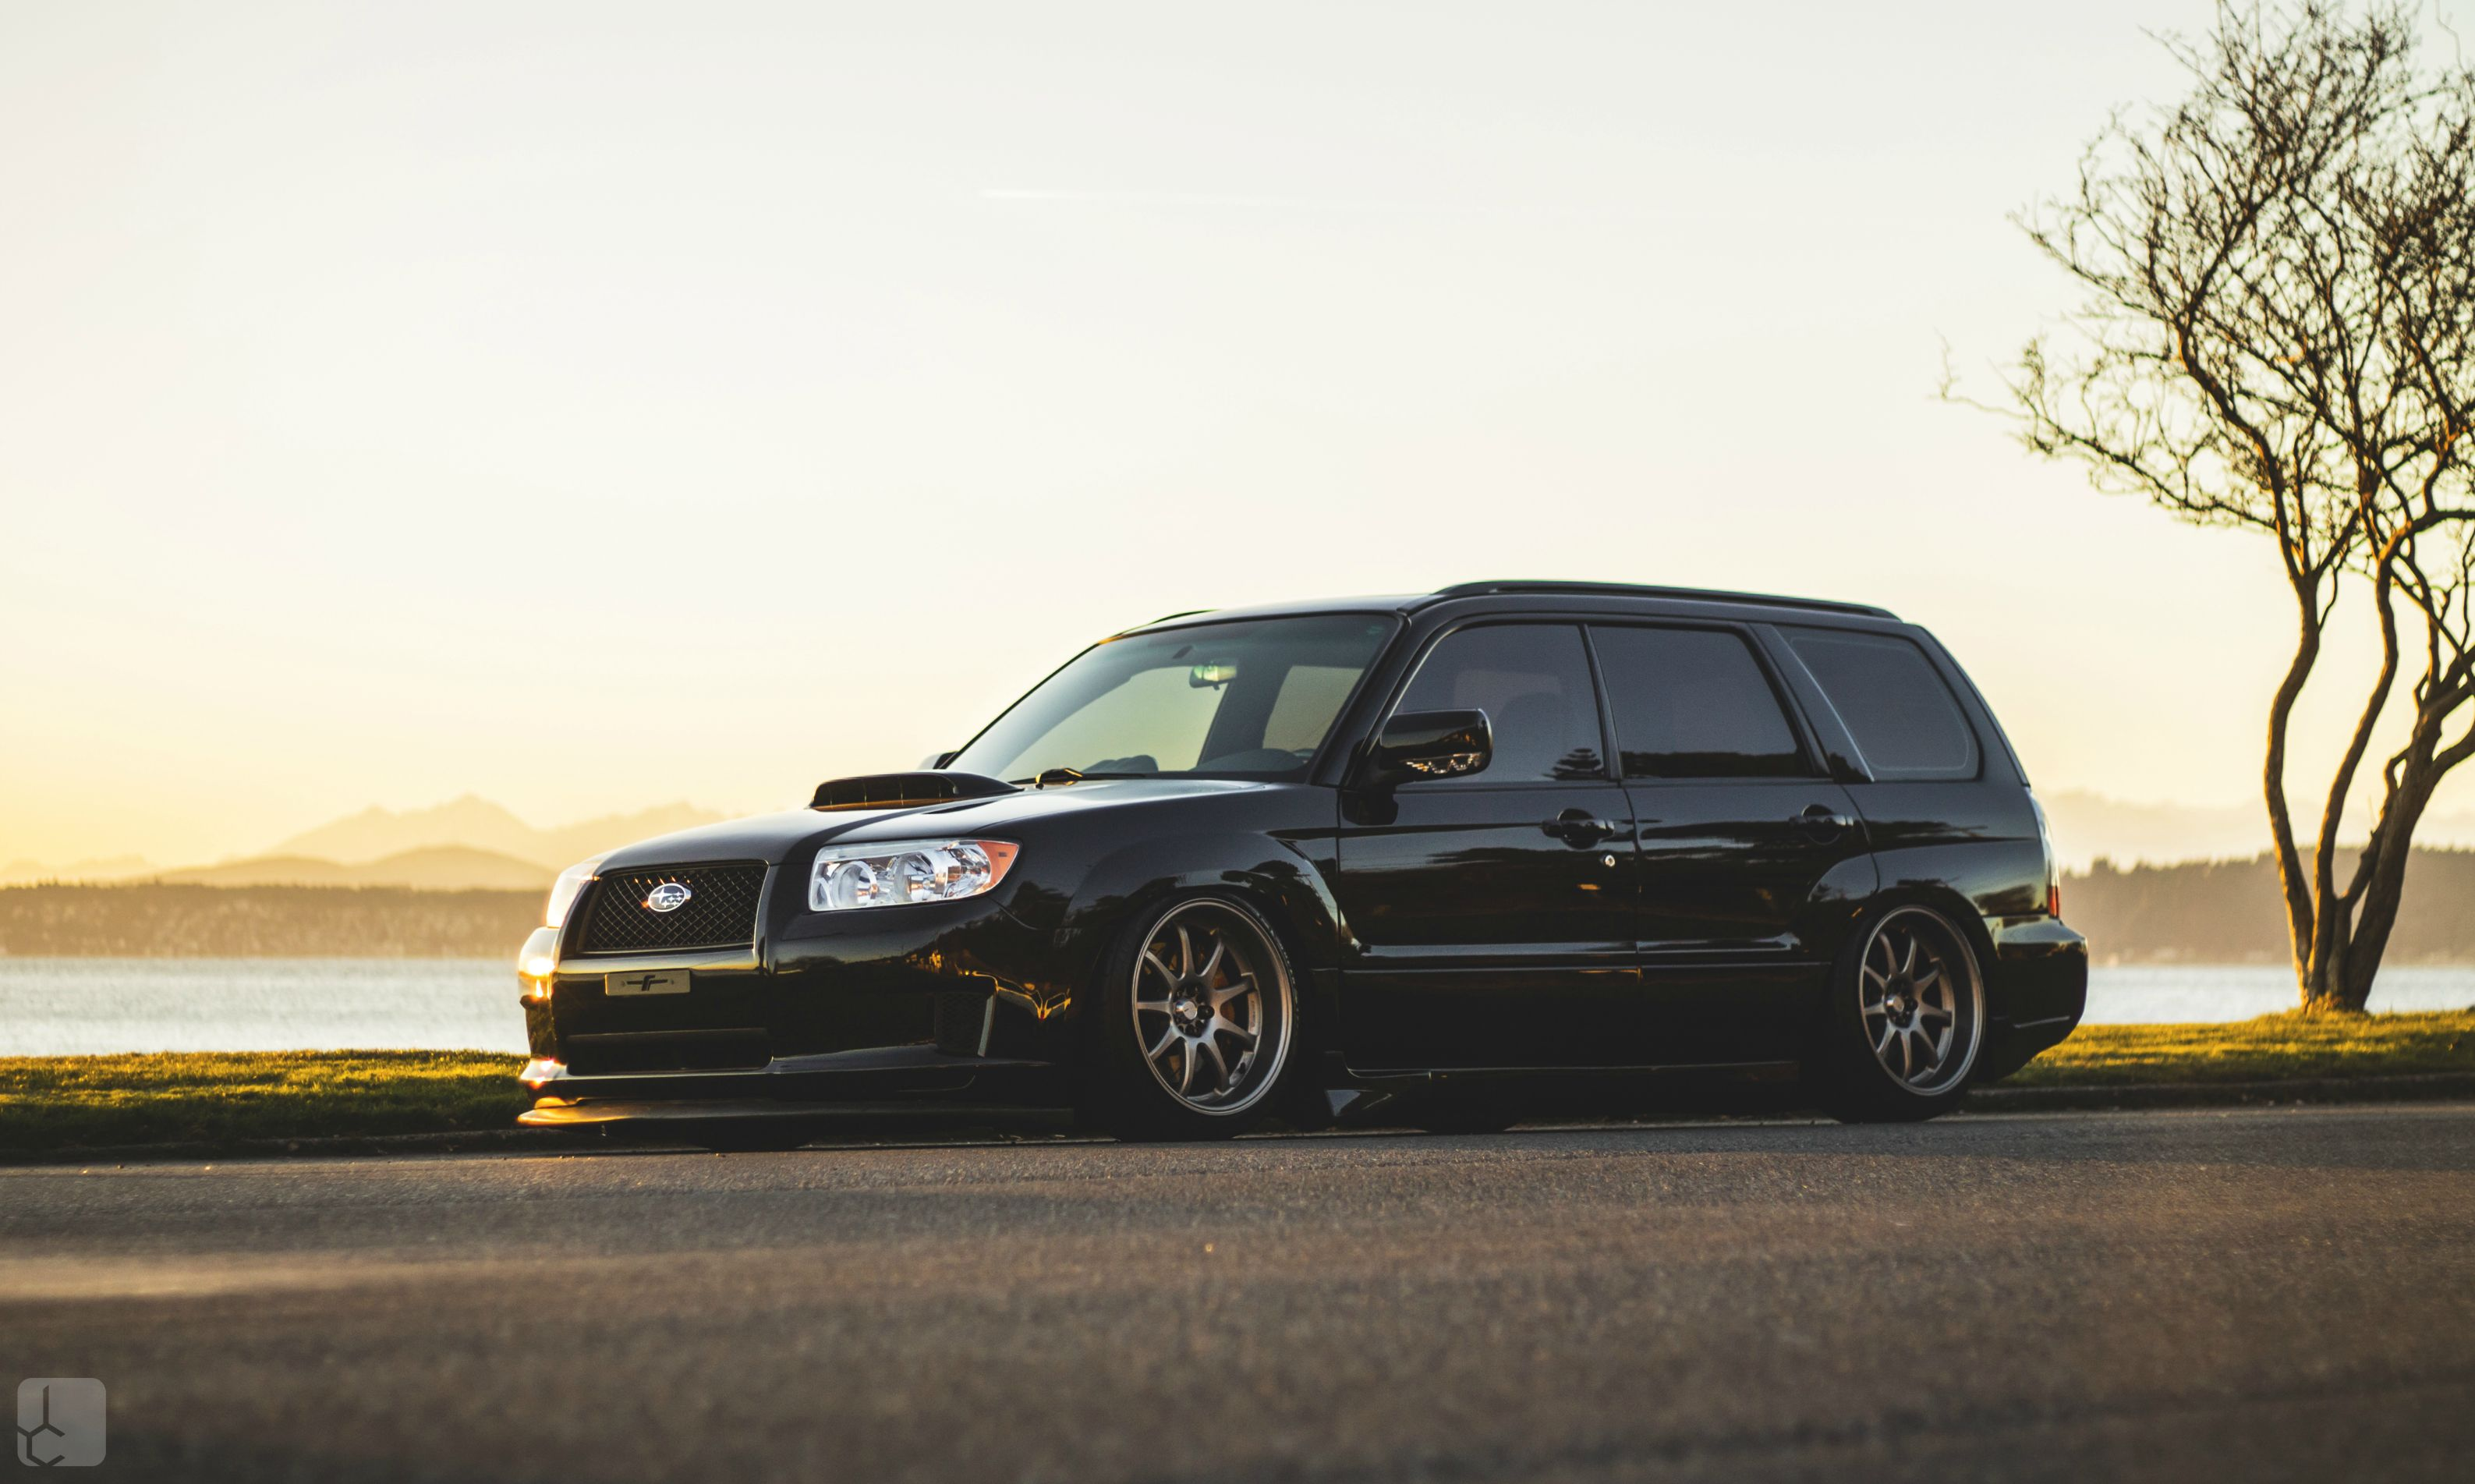 Subaru Forester Wallpaper Hd